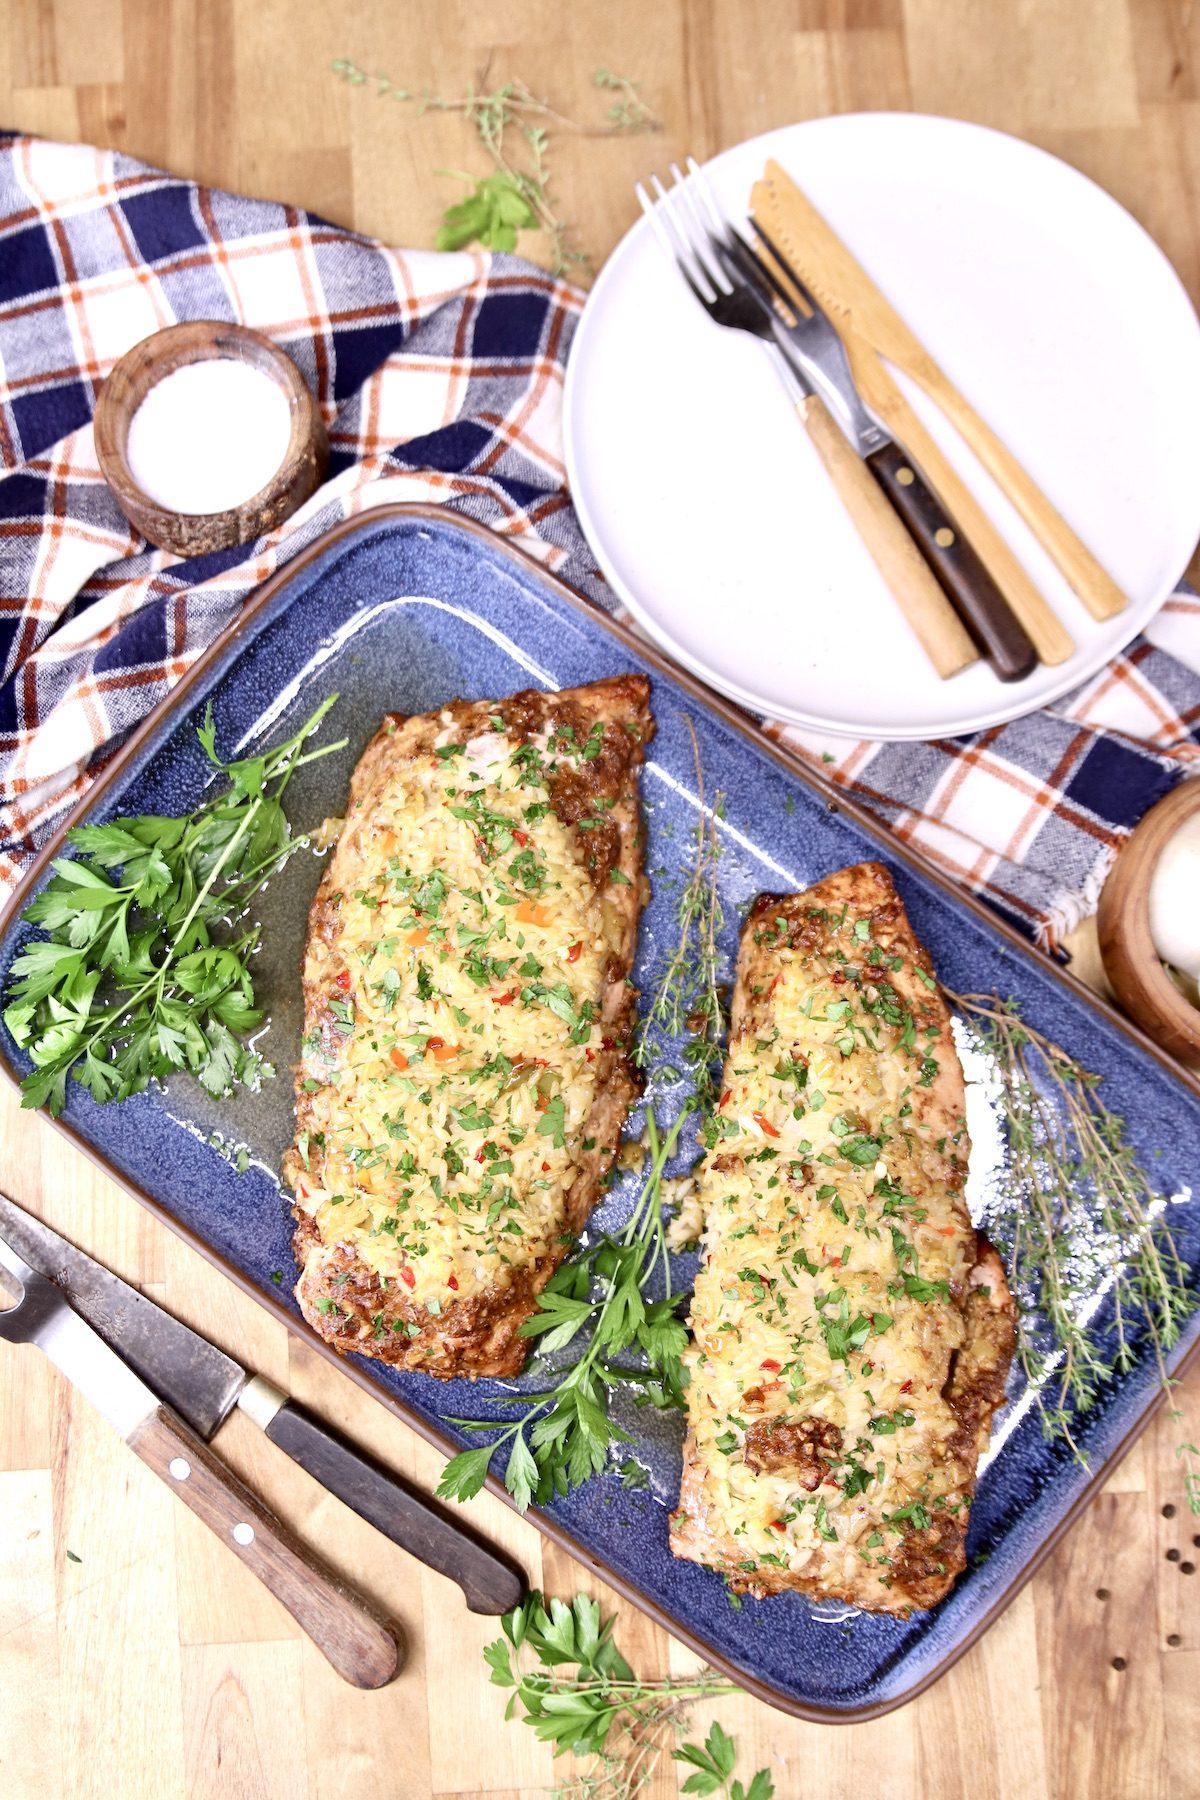 pork tenderloins on a platter, plates, forks